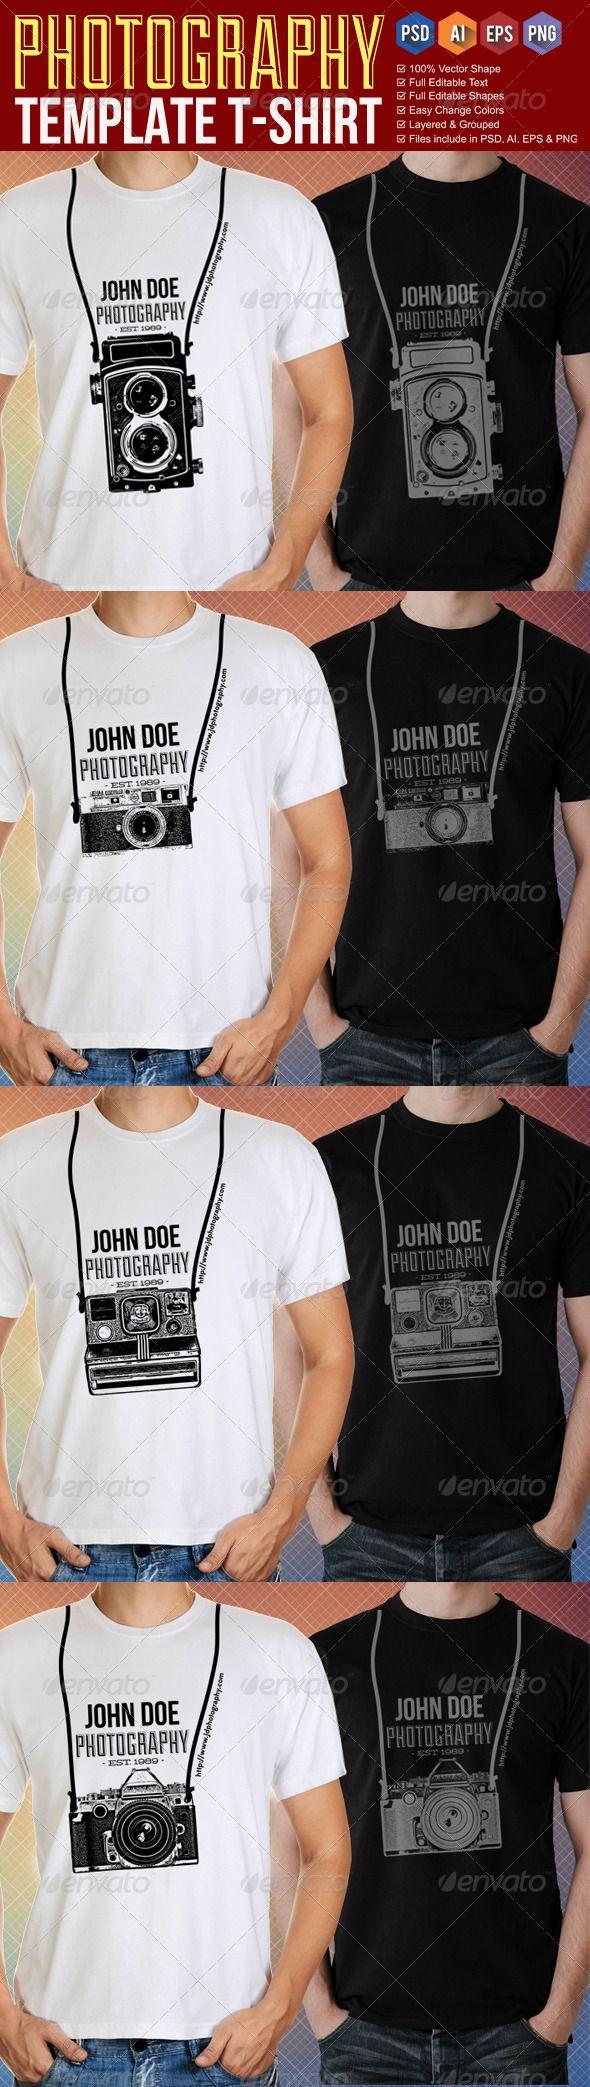 Download Graphic Logo Templates Epublishing Web Elements Vectors Photography T Shirt Templates Shirt Template Shirt Print Design Tshirt Photography